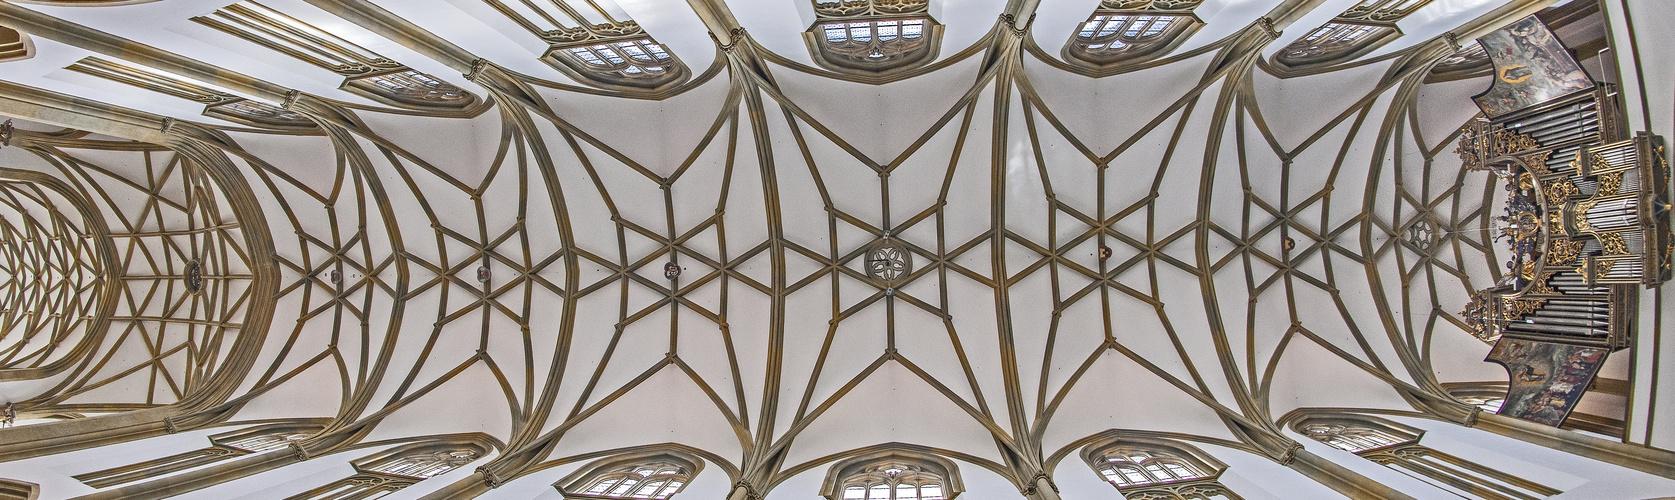 Basilika St. Ulrich - Augsburg